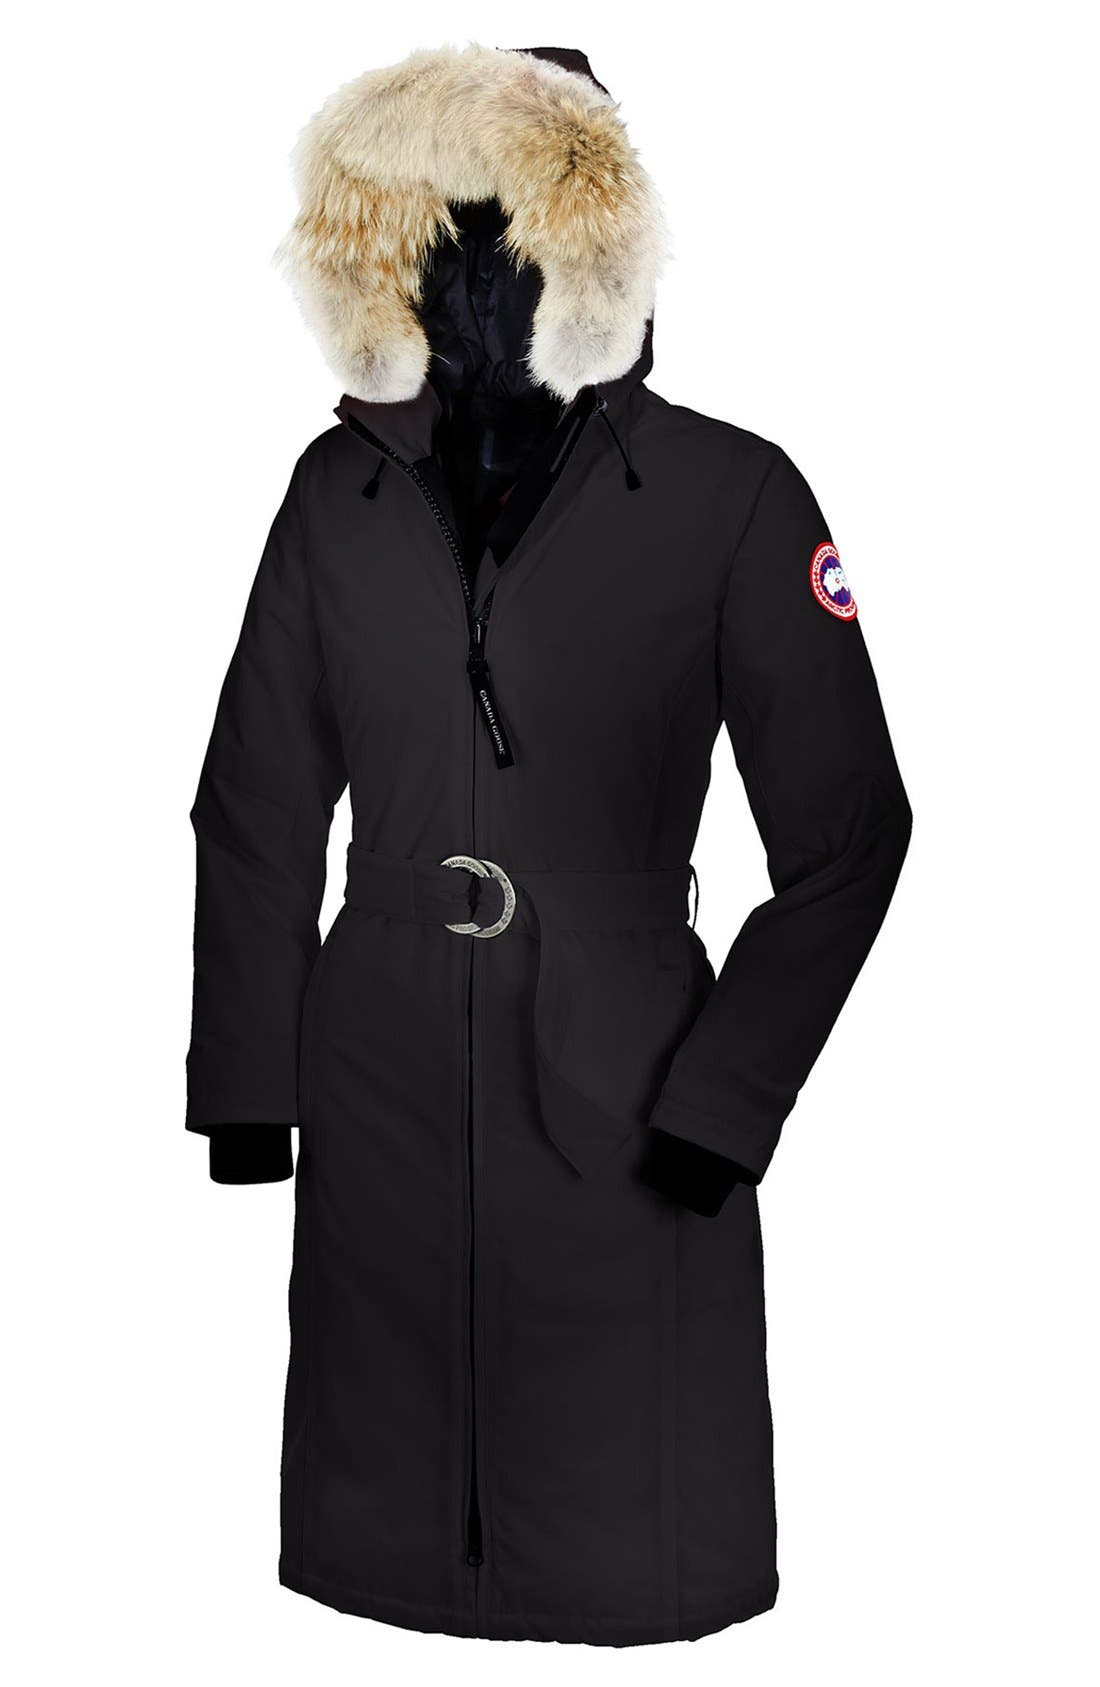 Alternate Image 1 Selected - Canada Goose 'Whistler' Genuine Coyote Fur Trim Slim Fit Belted Long Down Parka